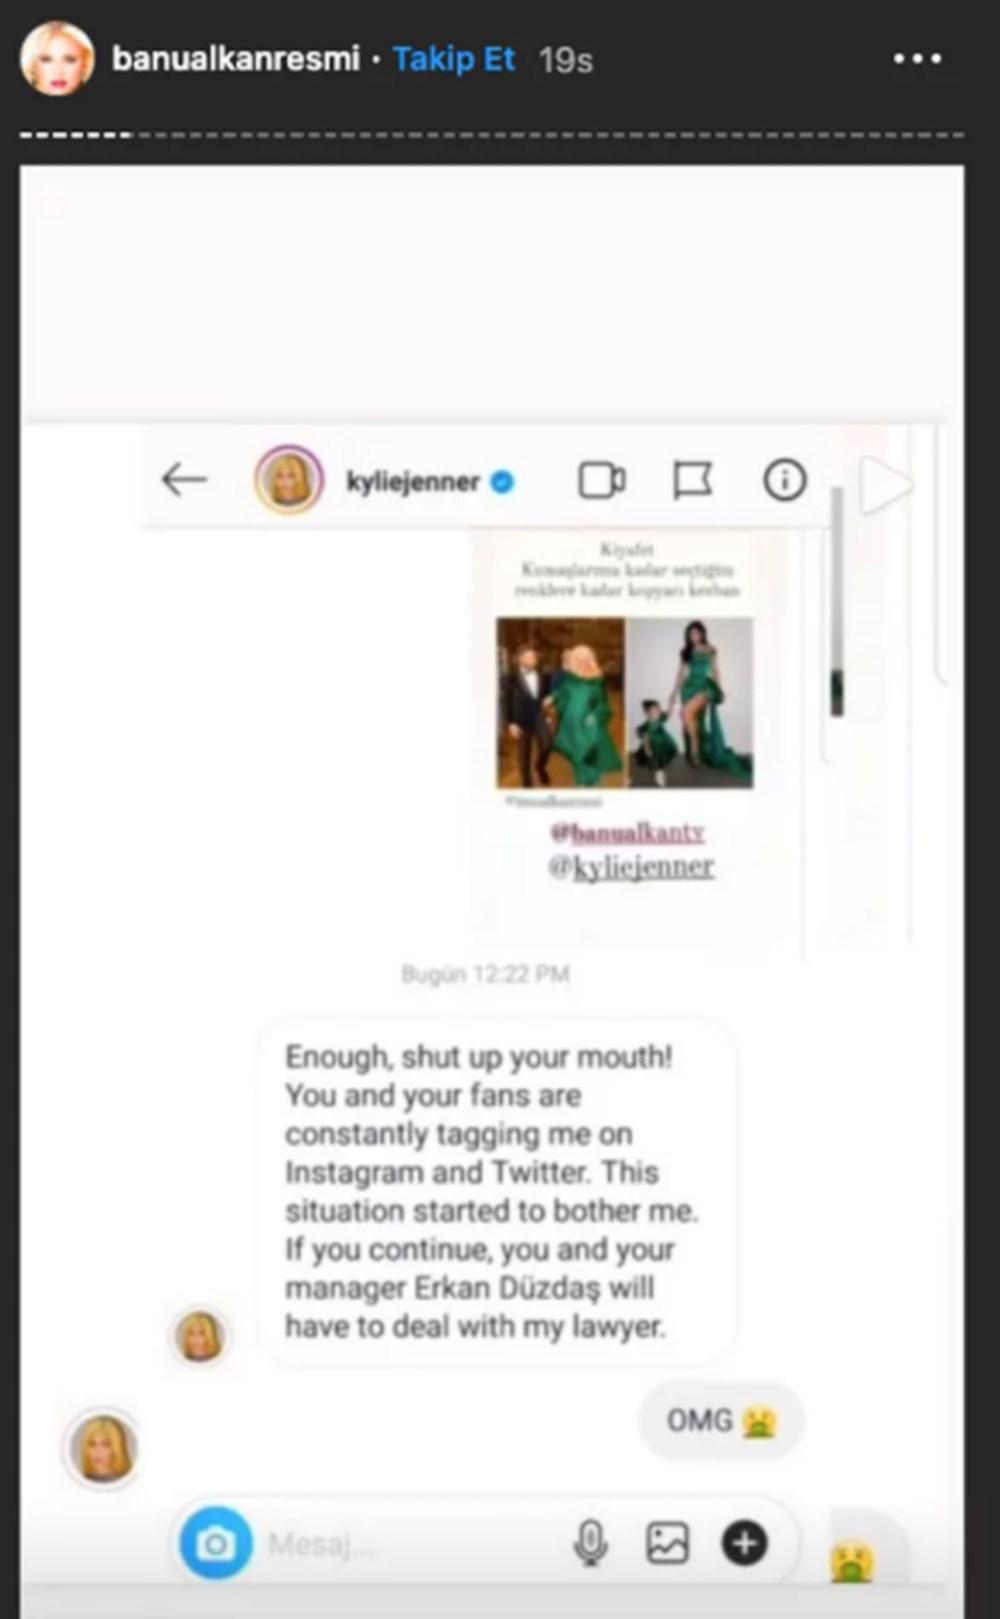 Bu hikayede bir gariplik var: Kylie Jenner'dan Banu Alkan'a mesaj - 4